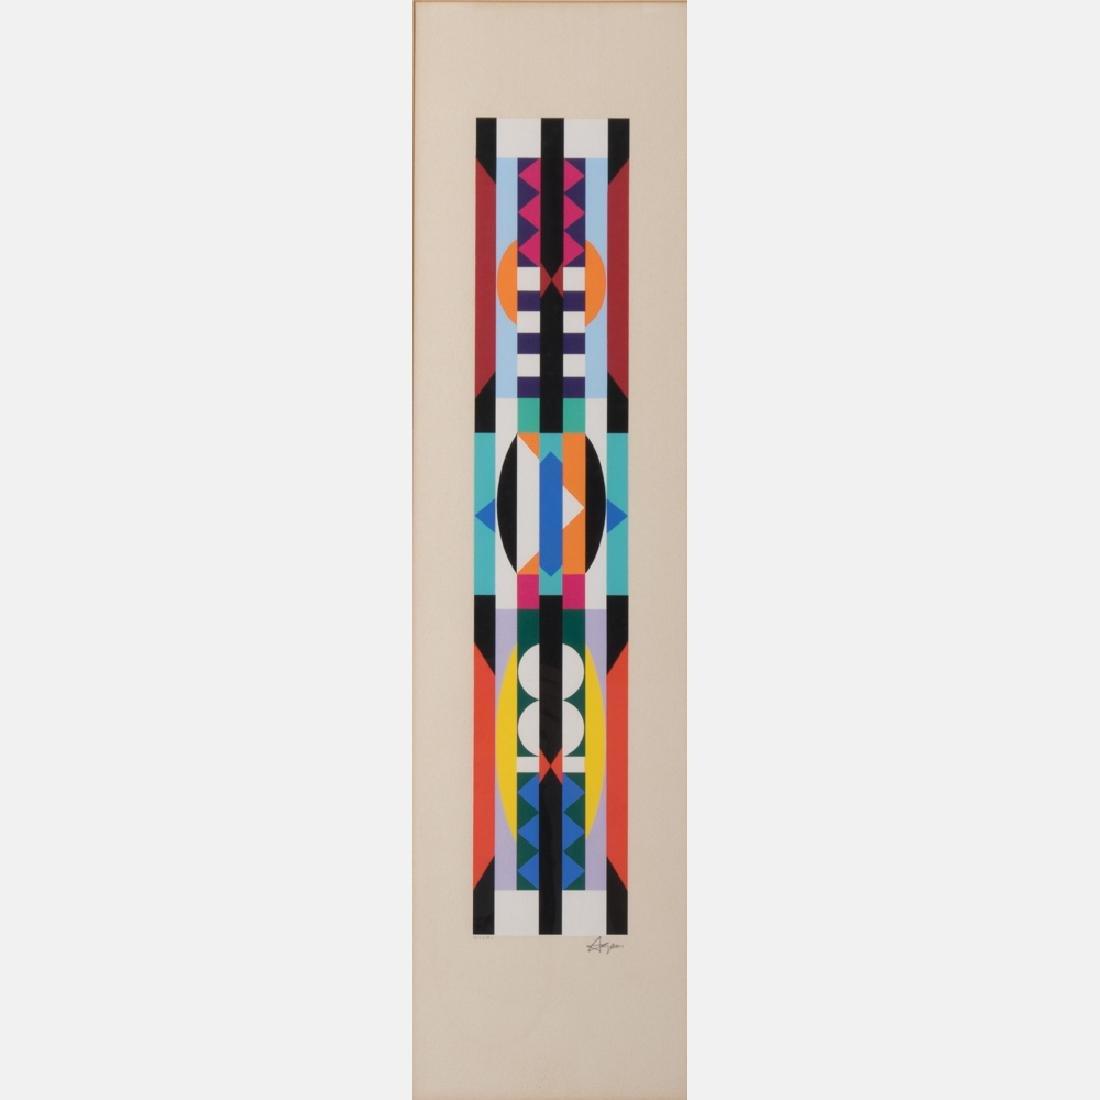 Yaacov Agam (b. 1928) Untitled, ca. 1970, Silkscreen,